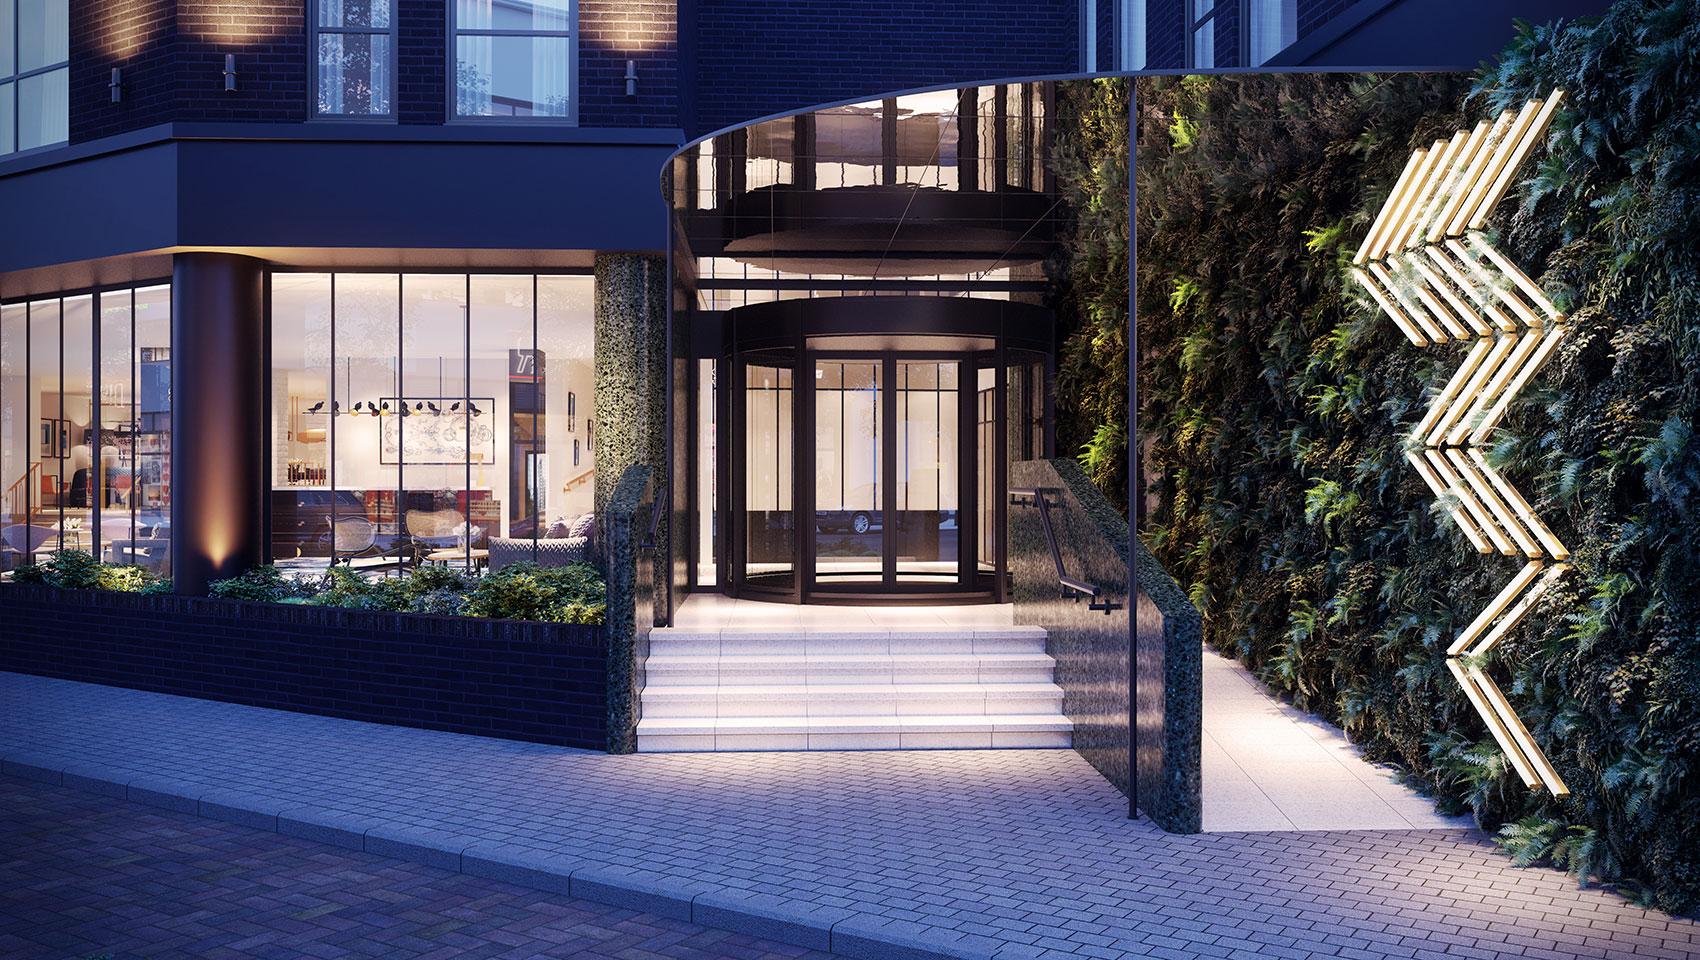 Kimpton Hotels Amp Restaurants Makes Its Debut In Europe